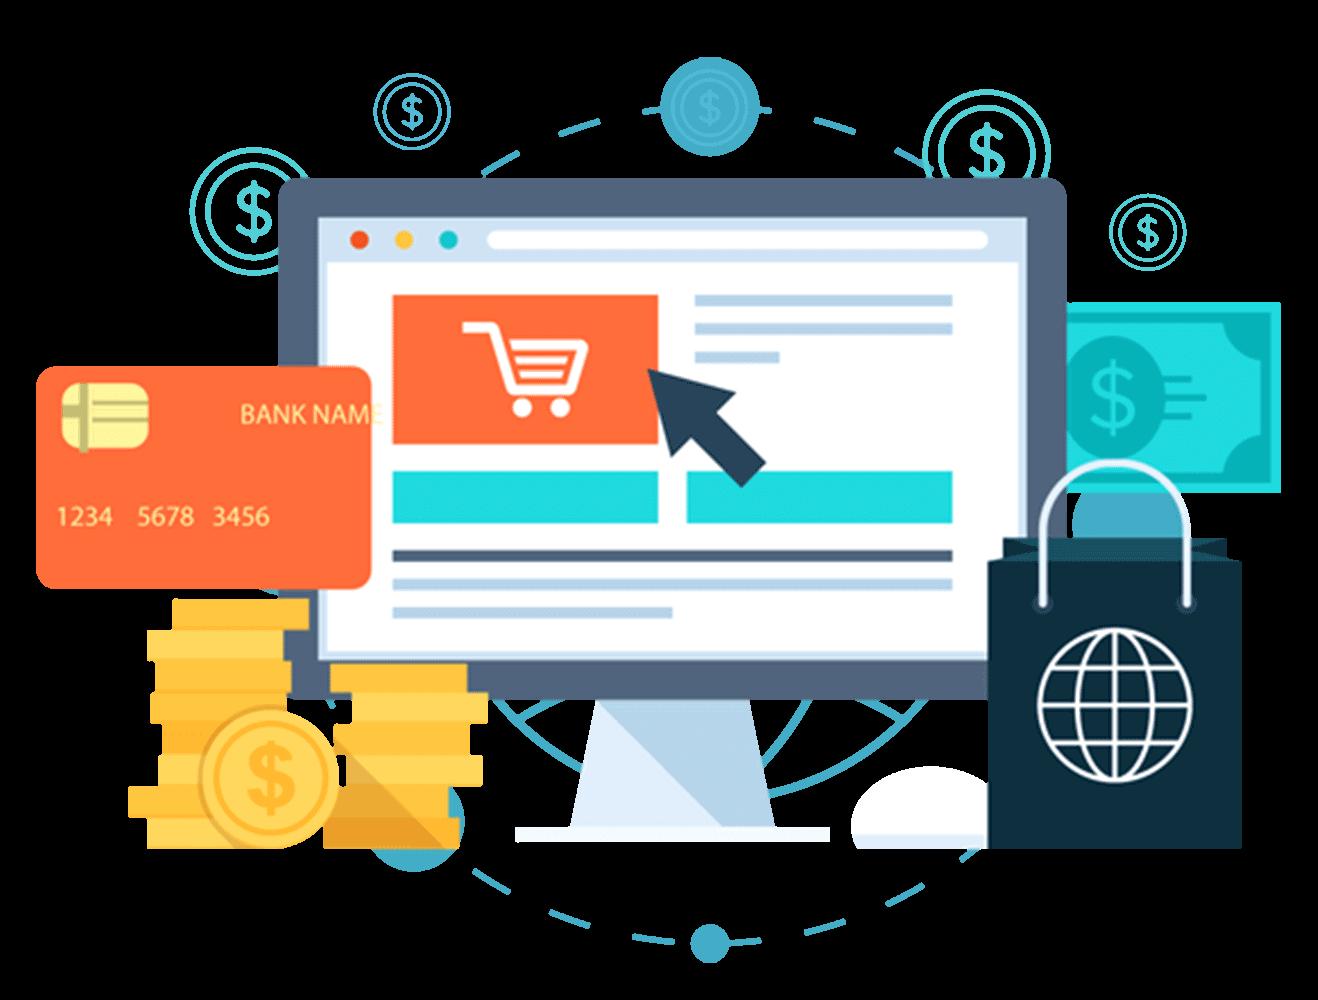 Brandcrock-online-payment-image2